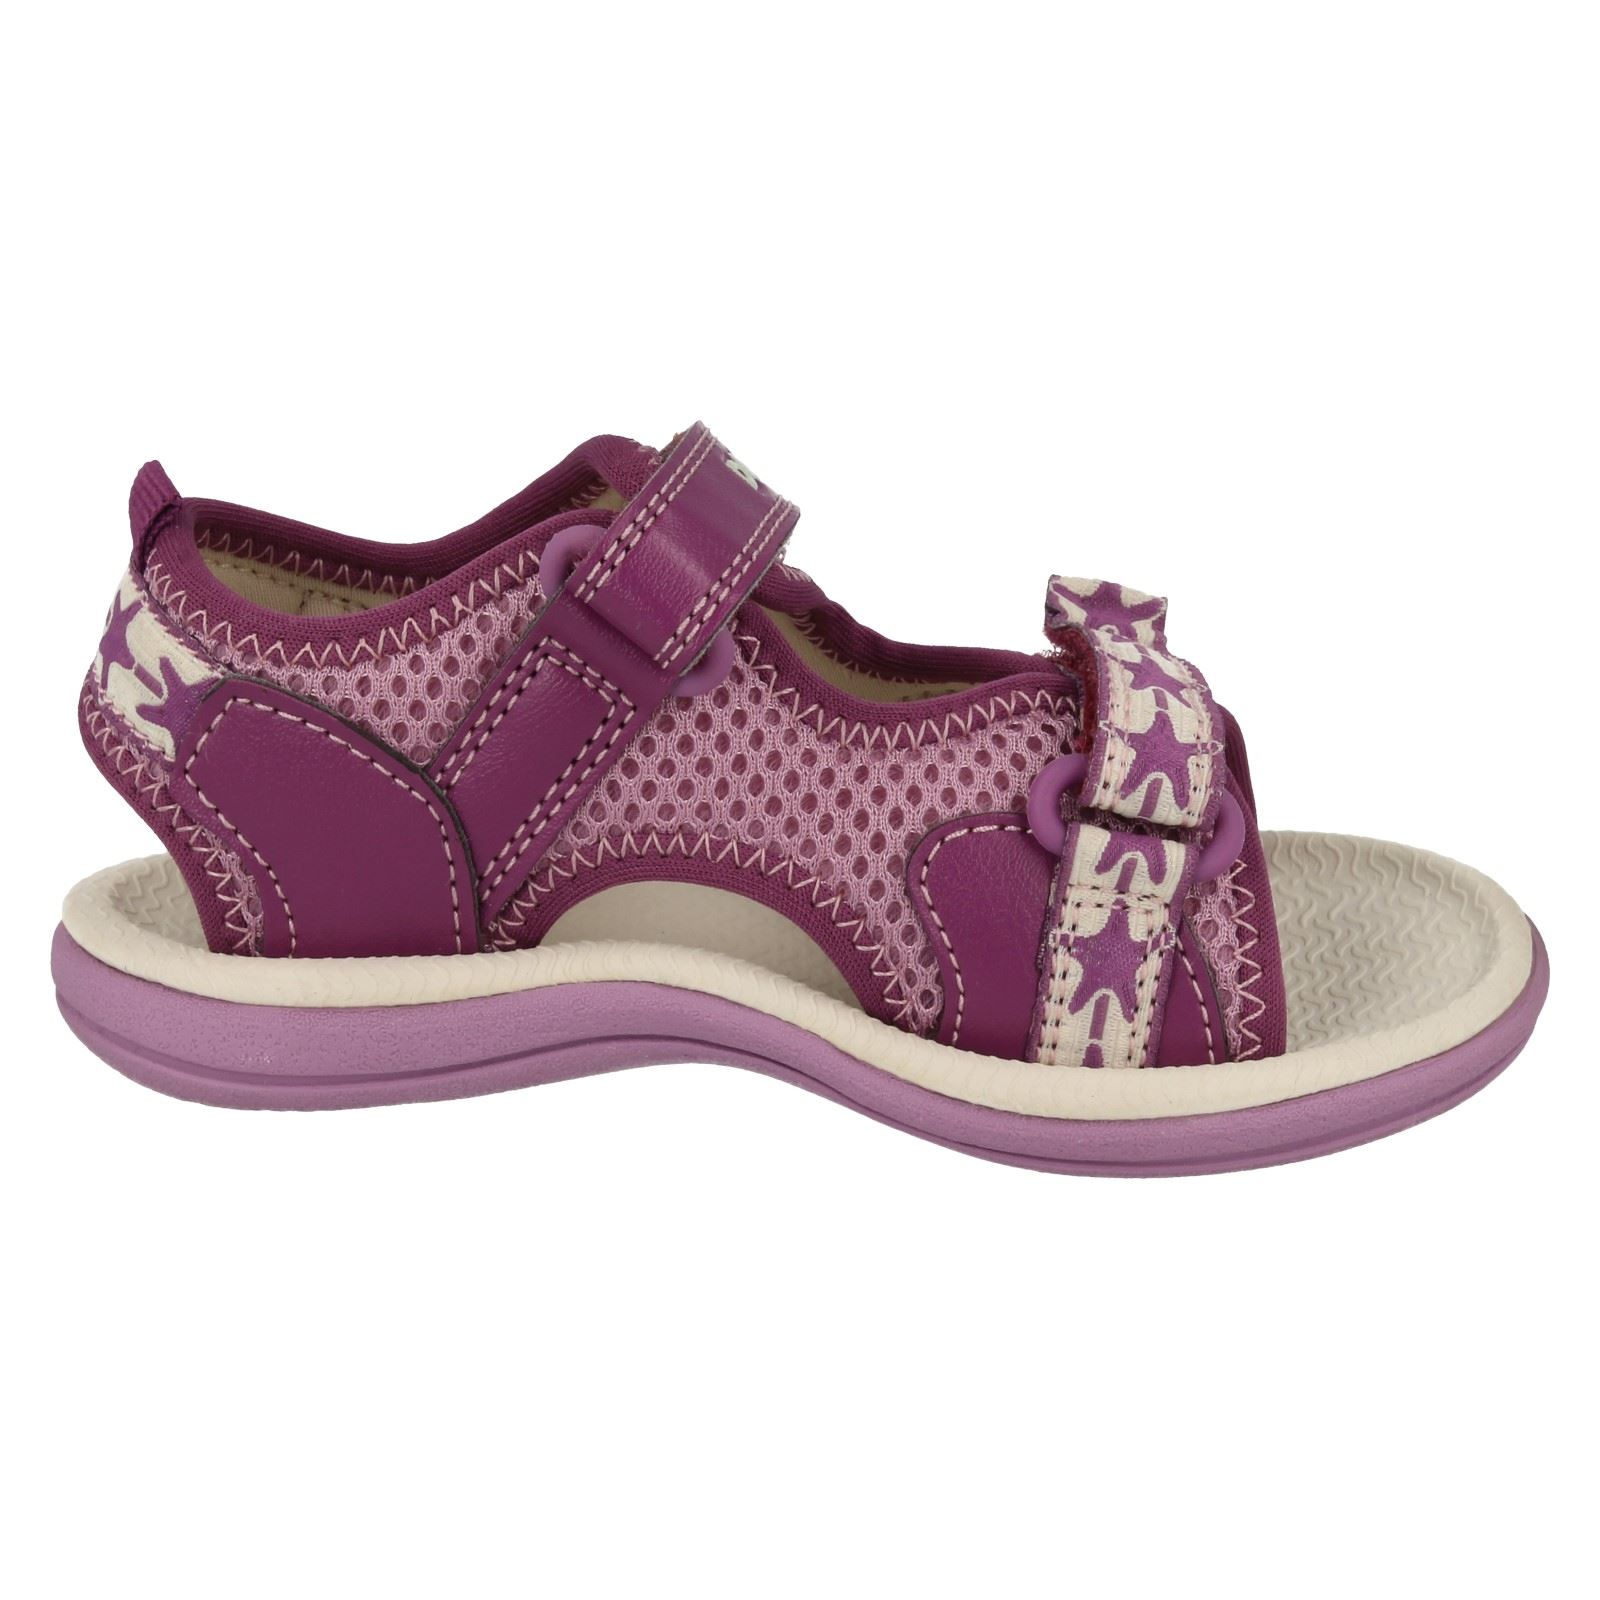 c3b7128d9fc9 039-Clarks-Girls-039-Sandals-Star-Games thumbnail 33